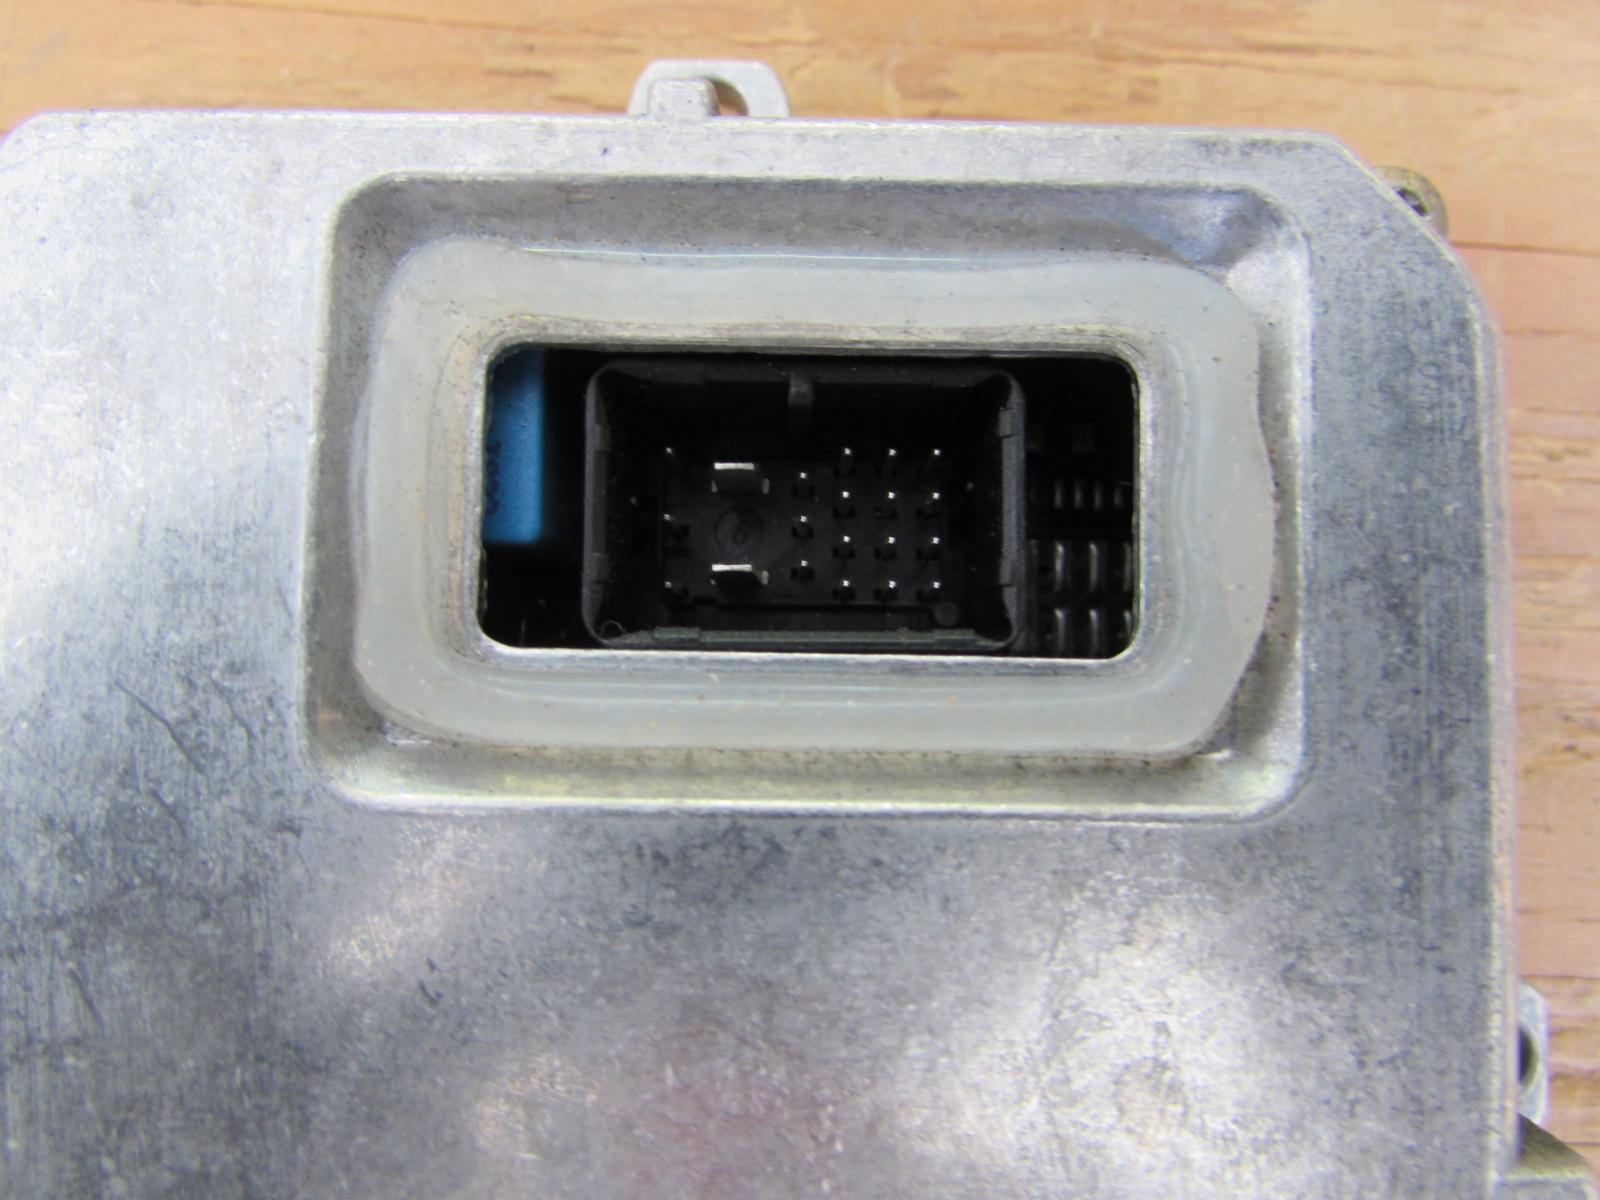 audi tt mk1 8n headlight xenon ballast control unit module. Black Bedroom Furniture Sets. Home Design Ideas